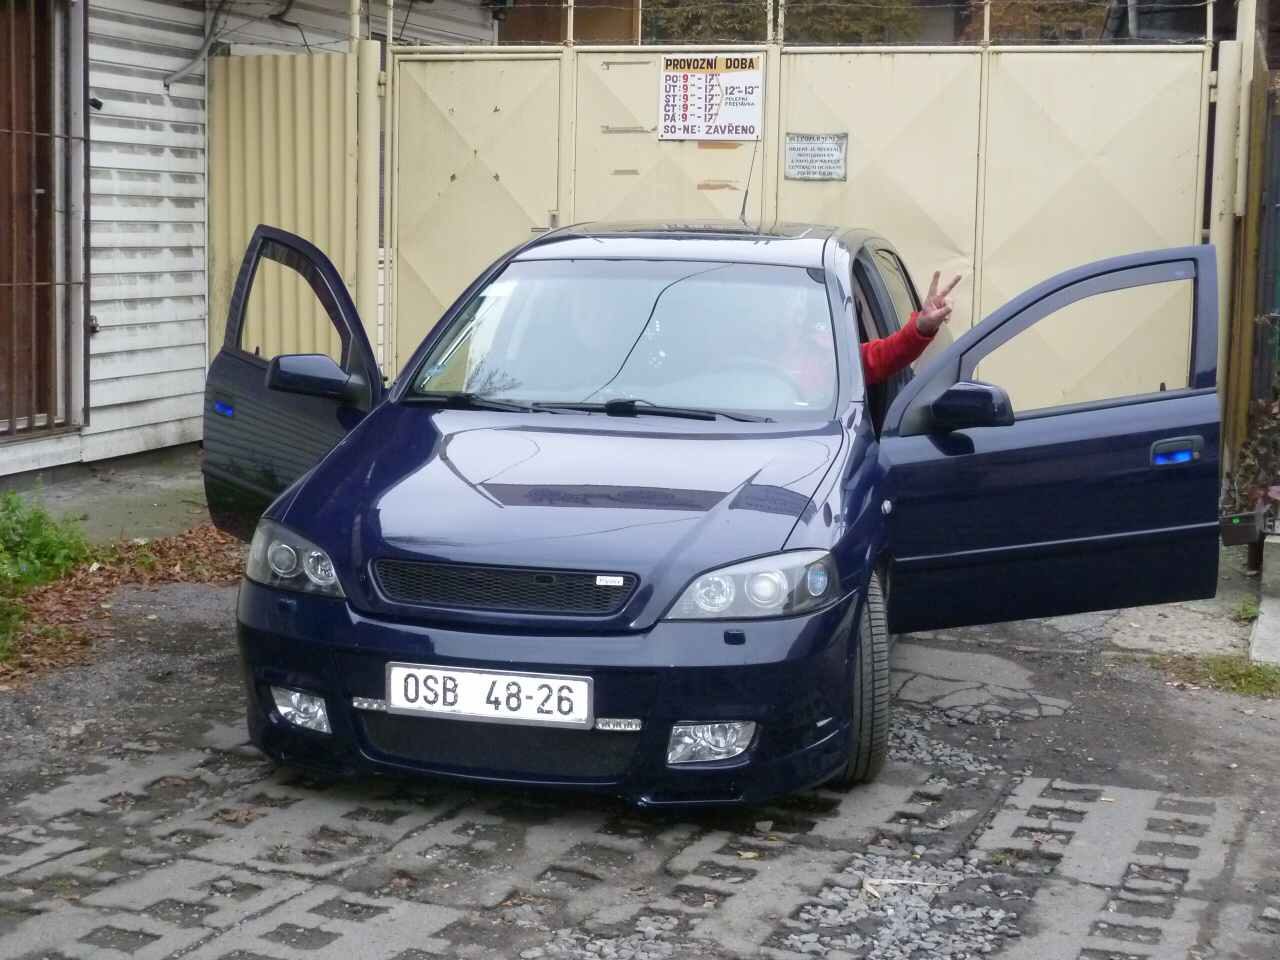 Opel Astra-Zafira sraz OSTRAVA 2010 – 16.10.